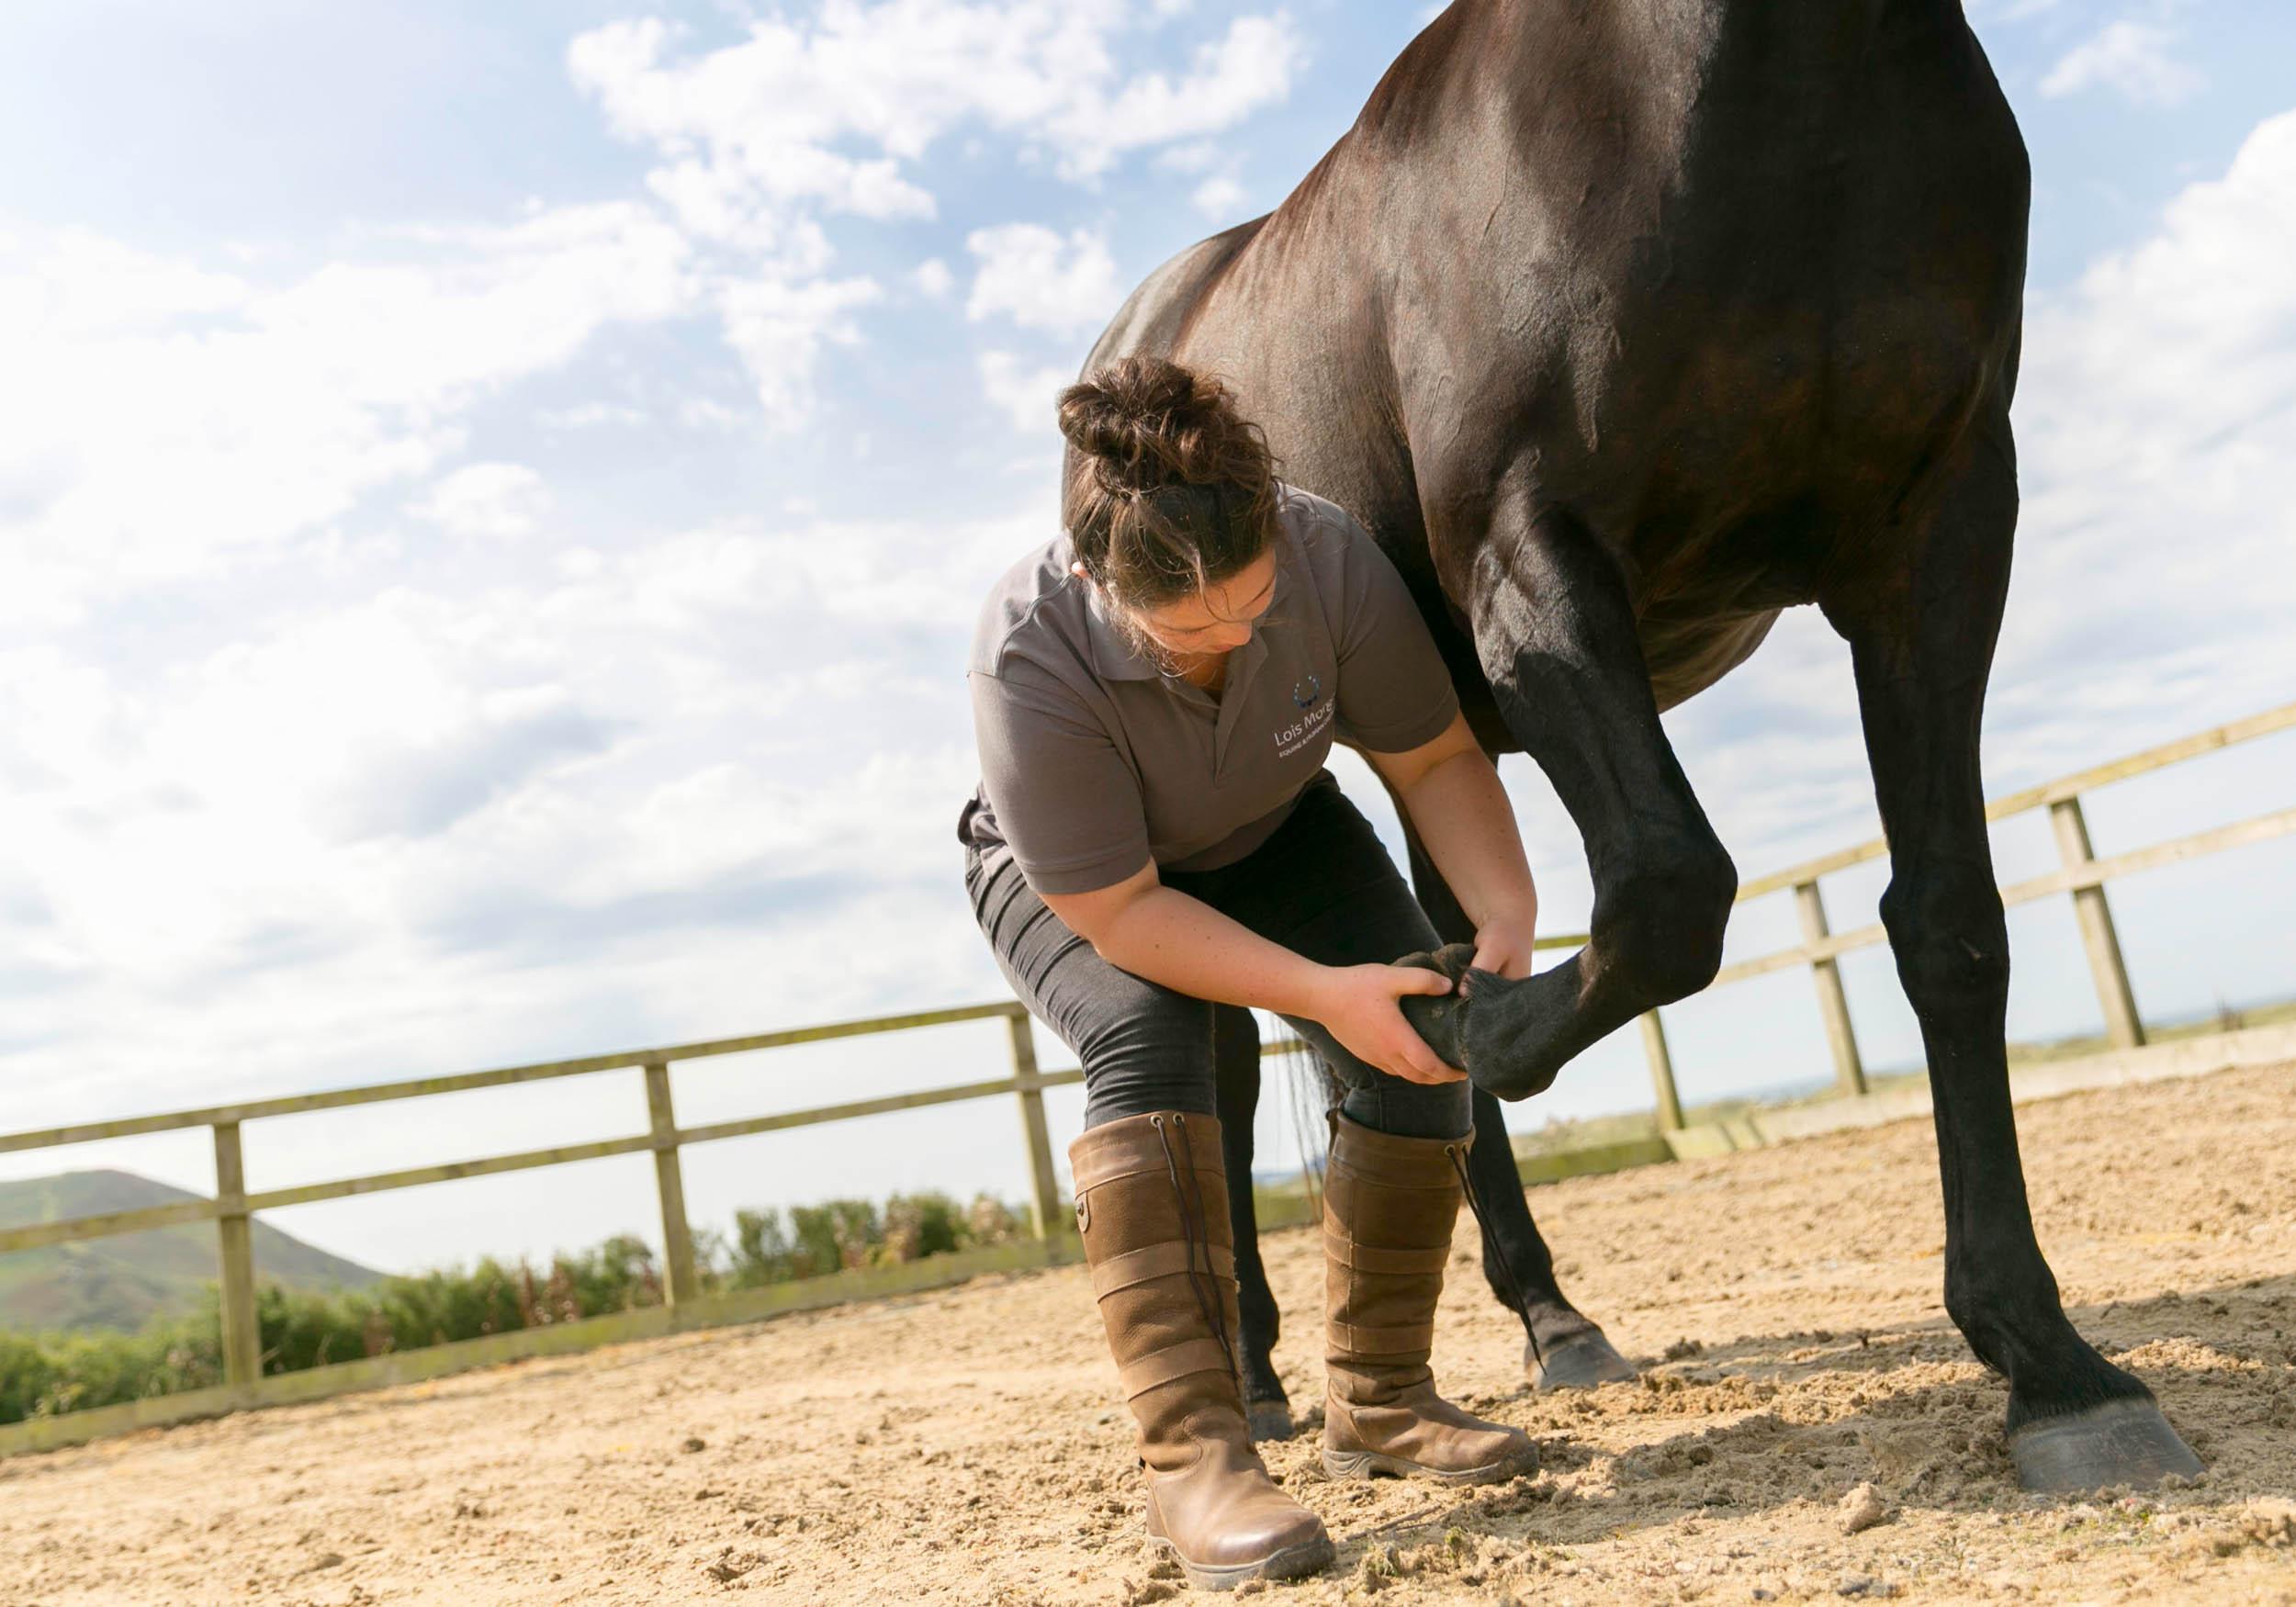 lois-morgan-equine-osteopath-carmarthenshire